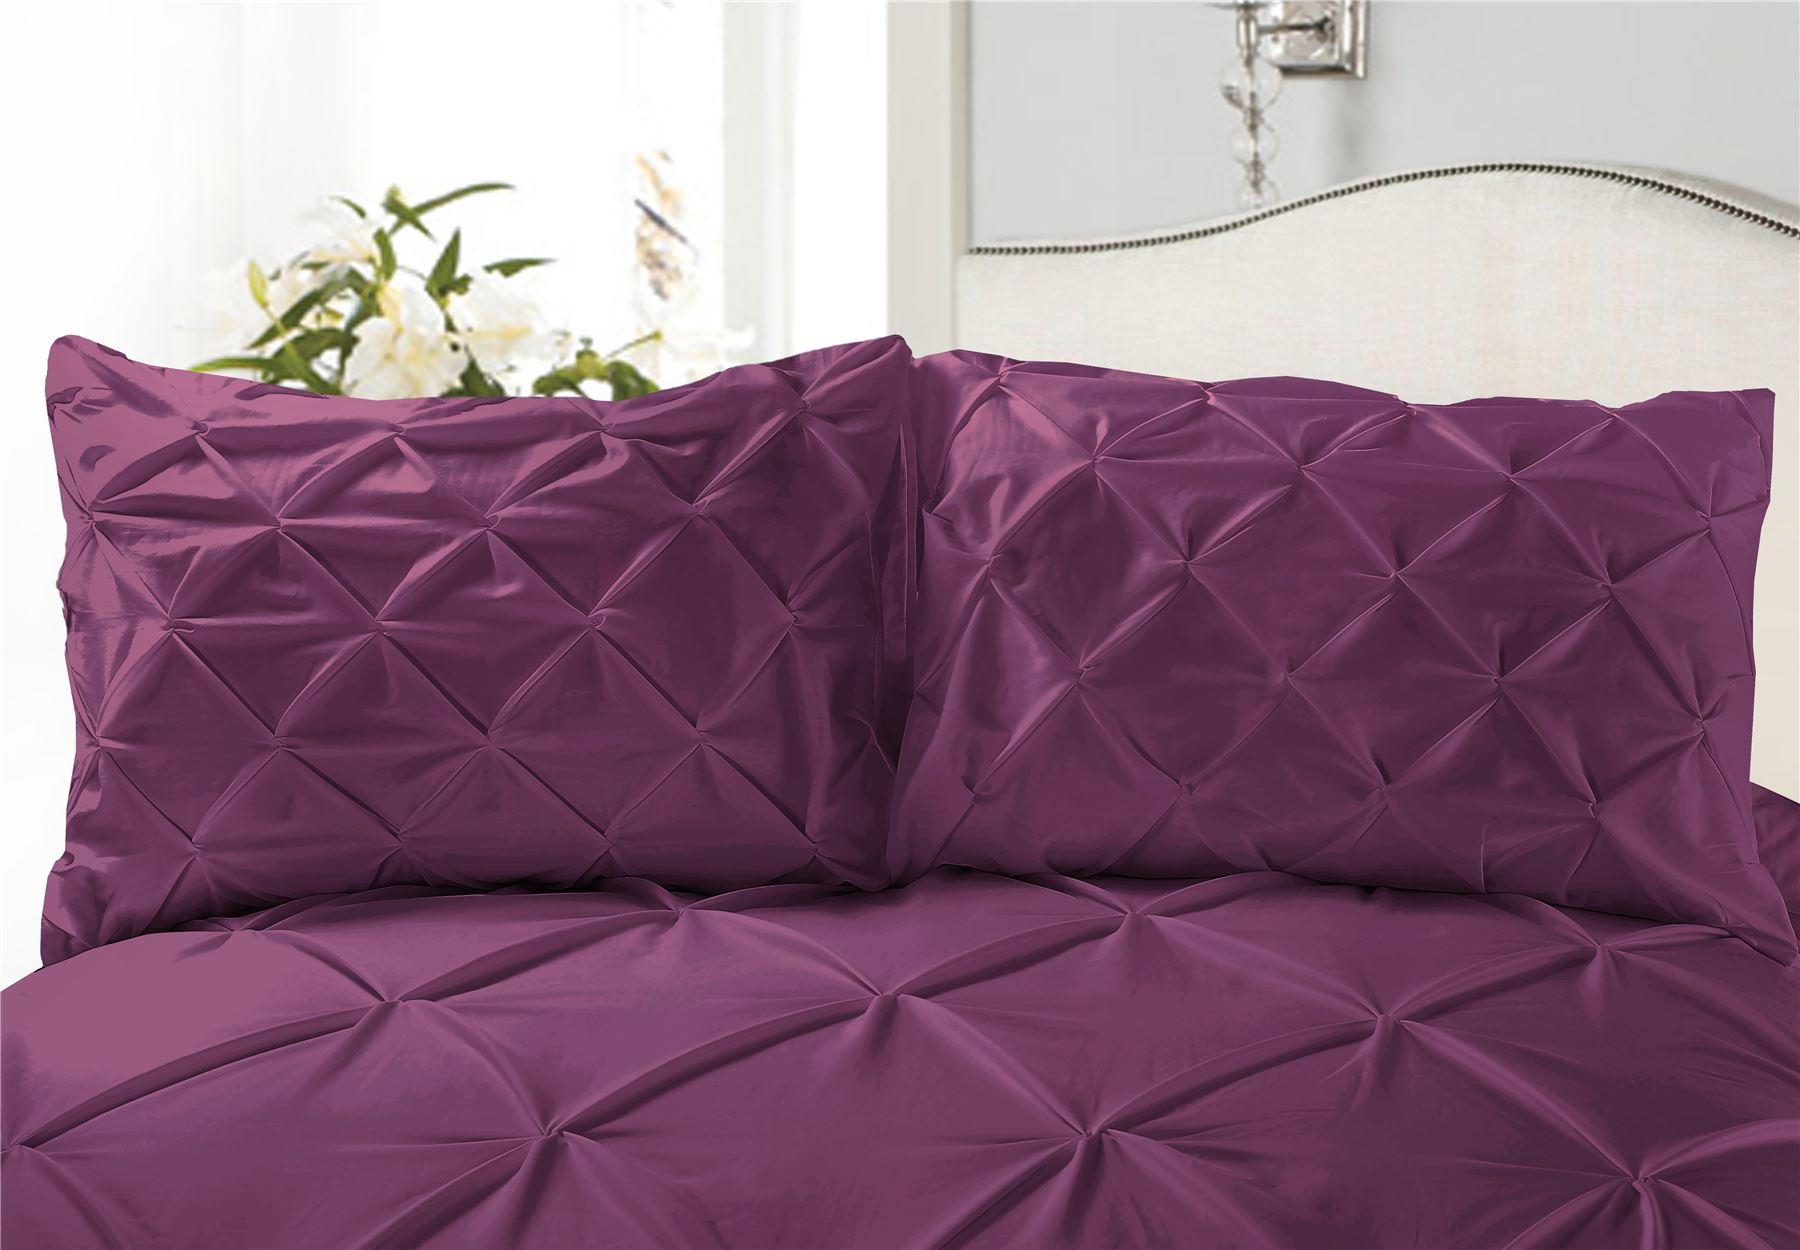 Luxury-Pure-100-Cotton-200-Thread-Pinch-Pleat-Pintuck-Puckering-Duvet-Cover-Set thumbnail 29